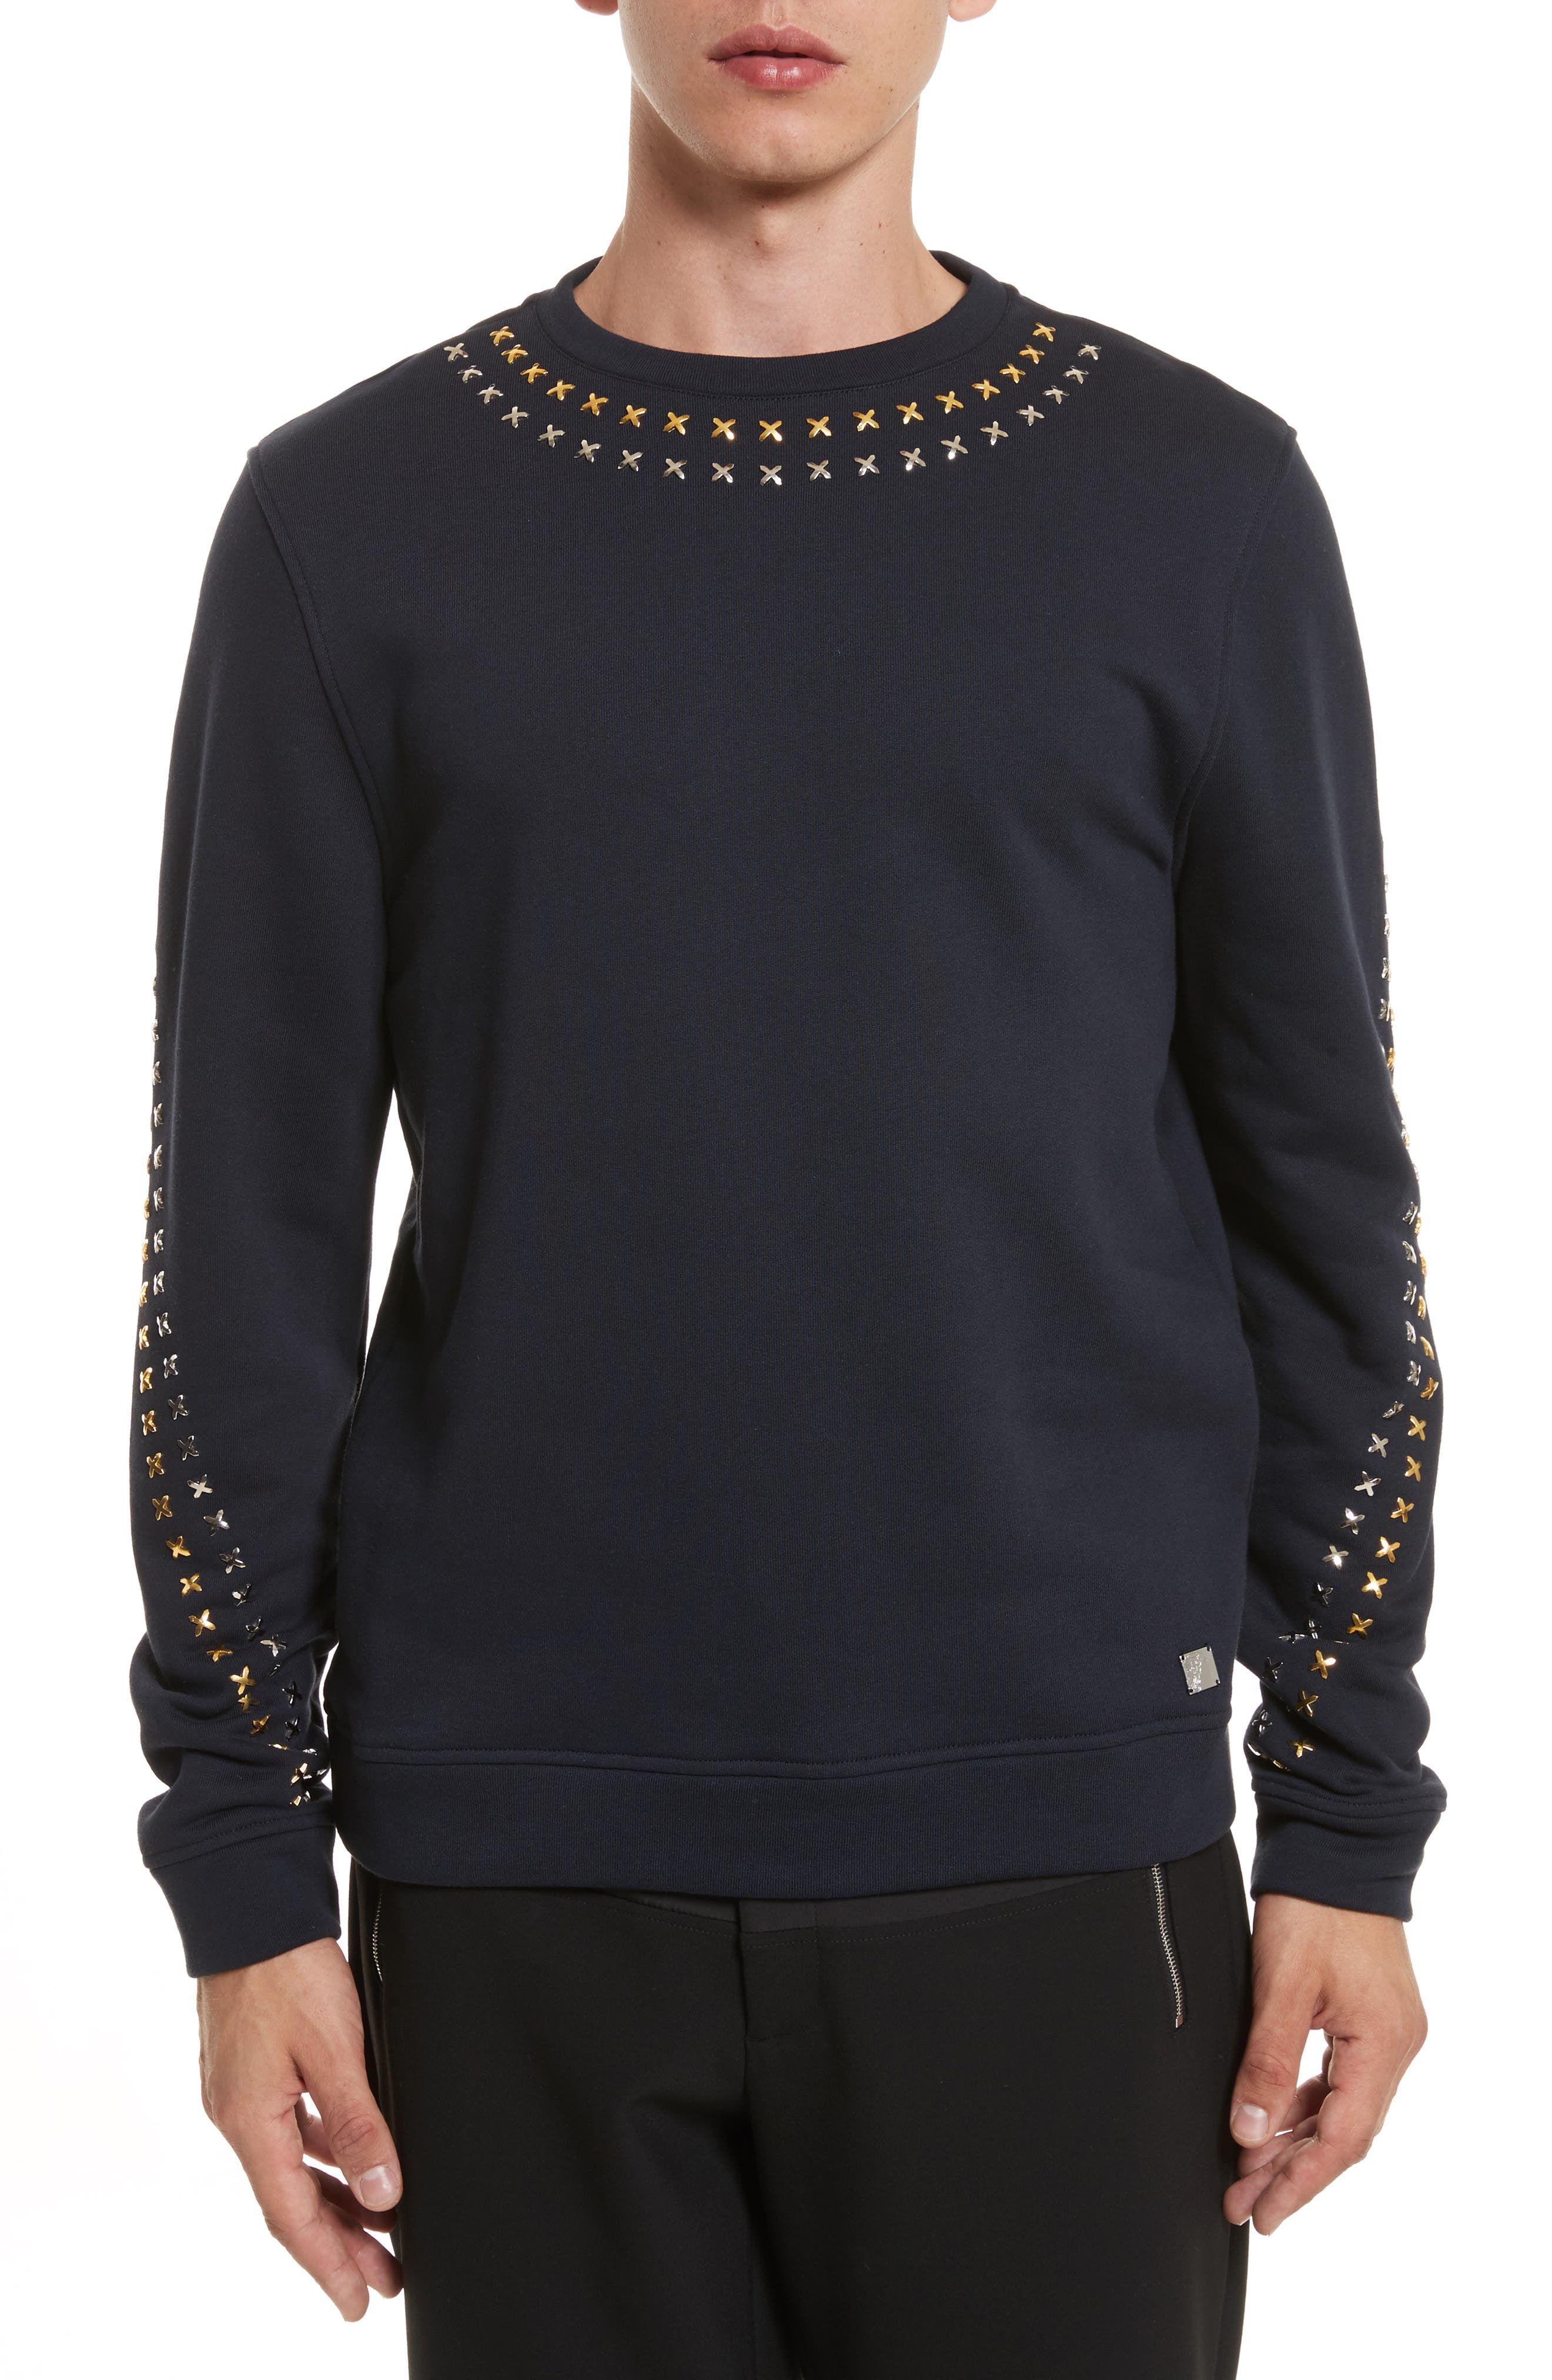 Main Image - Versace Collection Studded Crewneck Sweatshirt